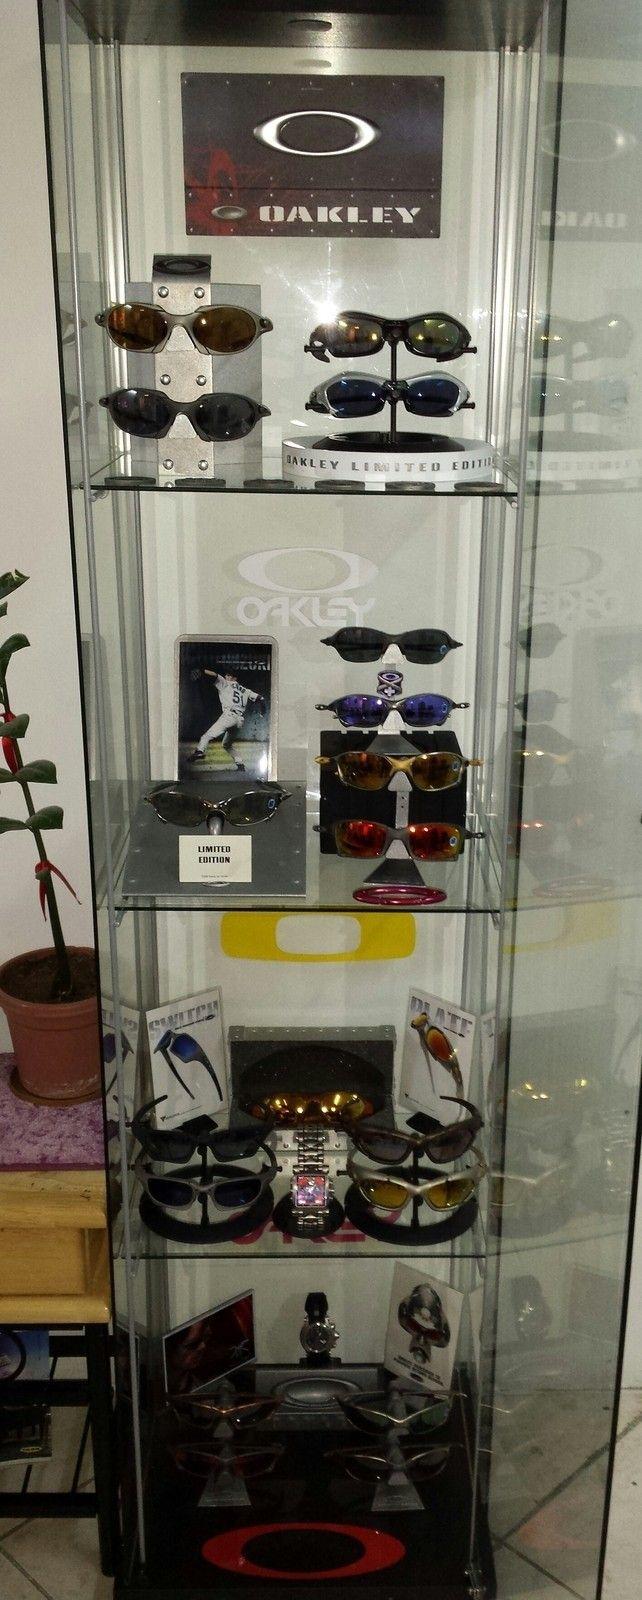 My Ikea Display Cabinet - uploadfromtaptalk1423043507342.jpg